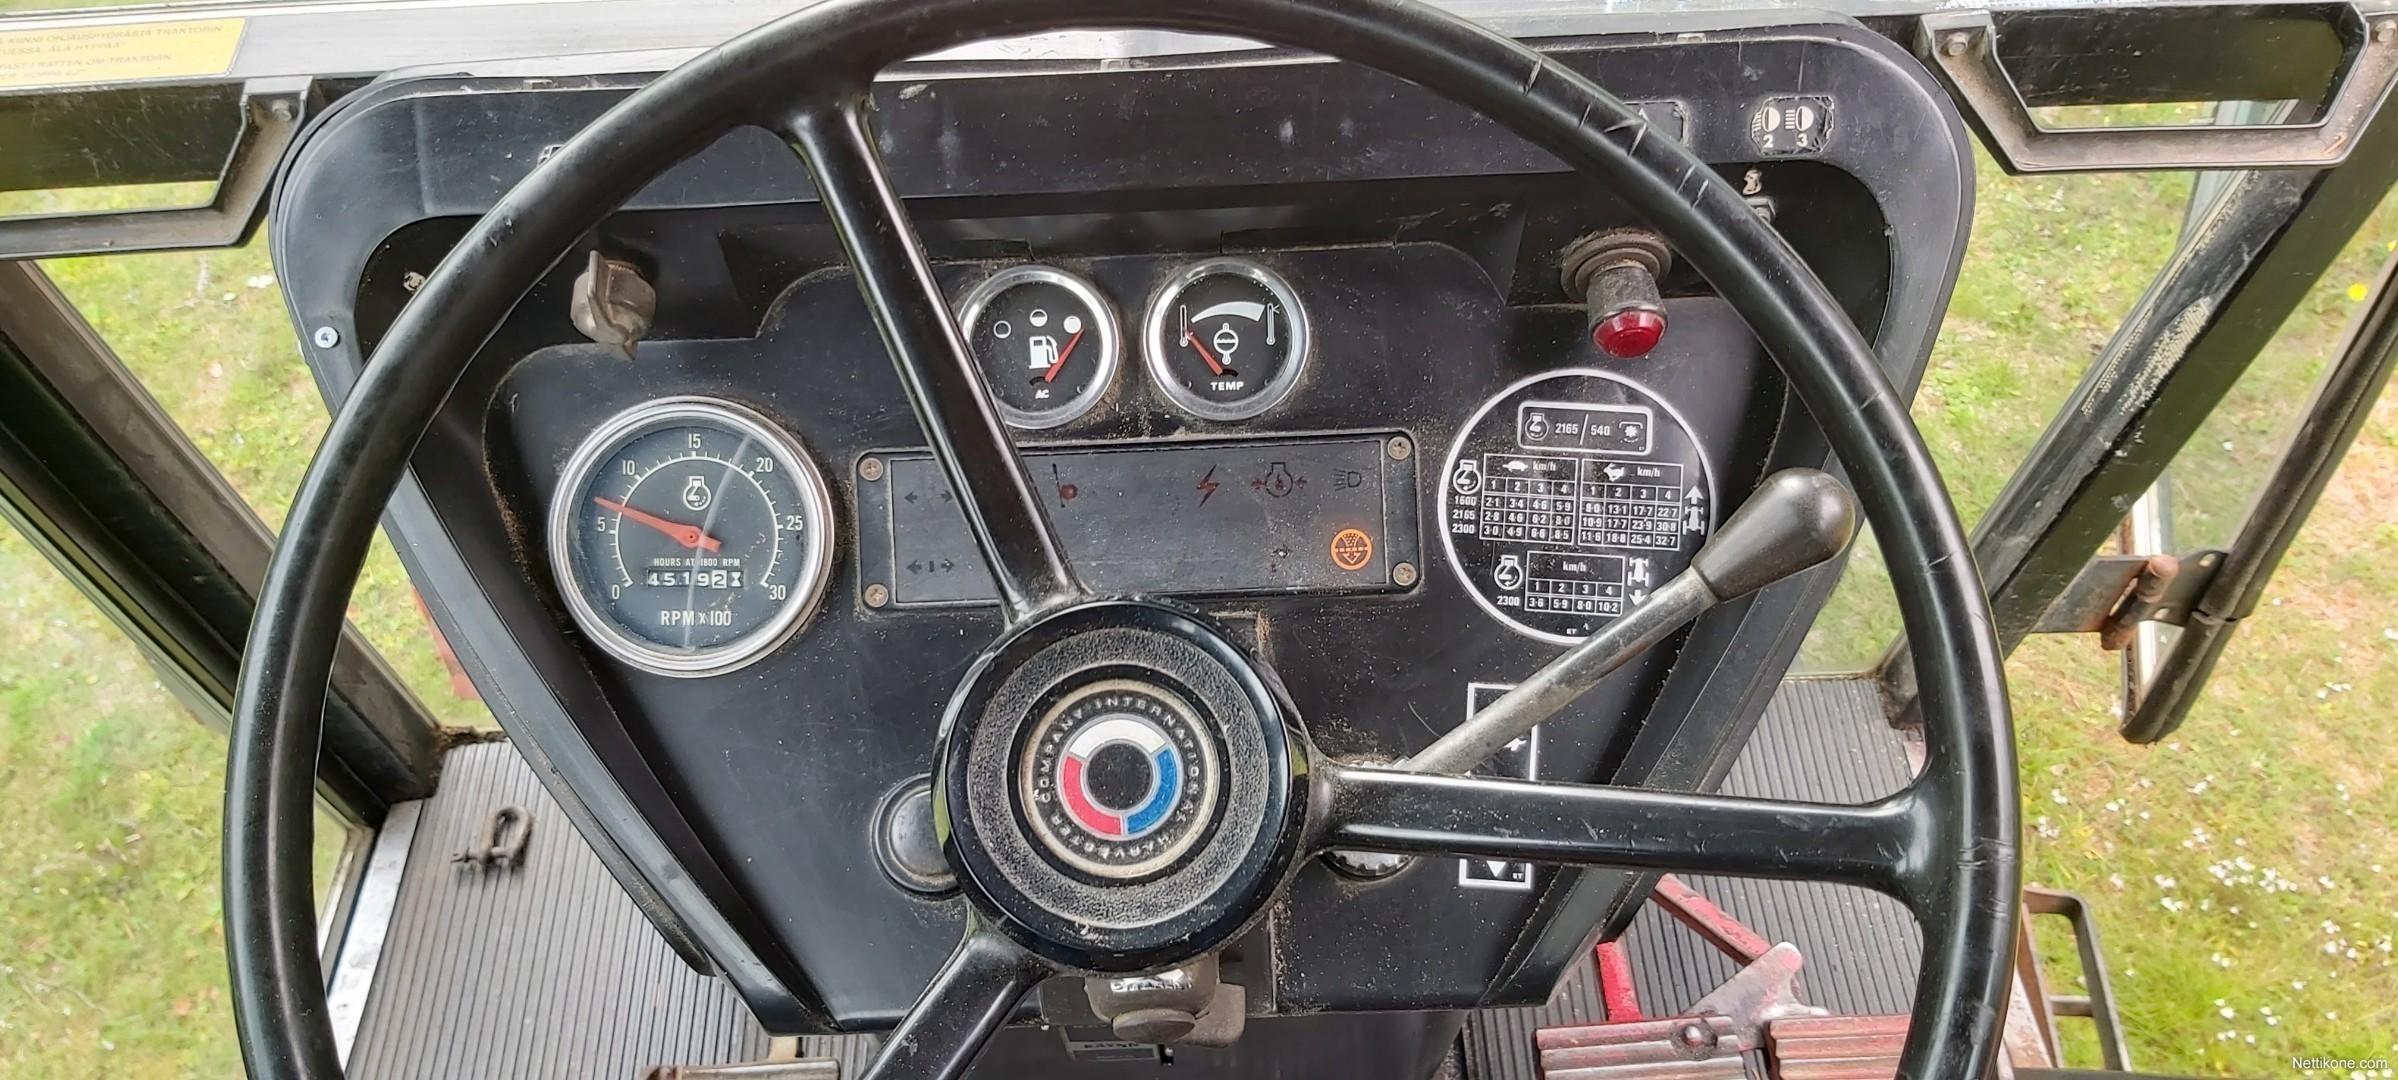 International 584 tractors, 1981 - Nettikone